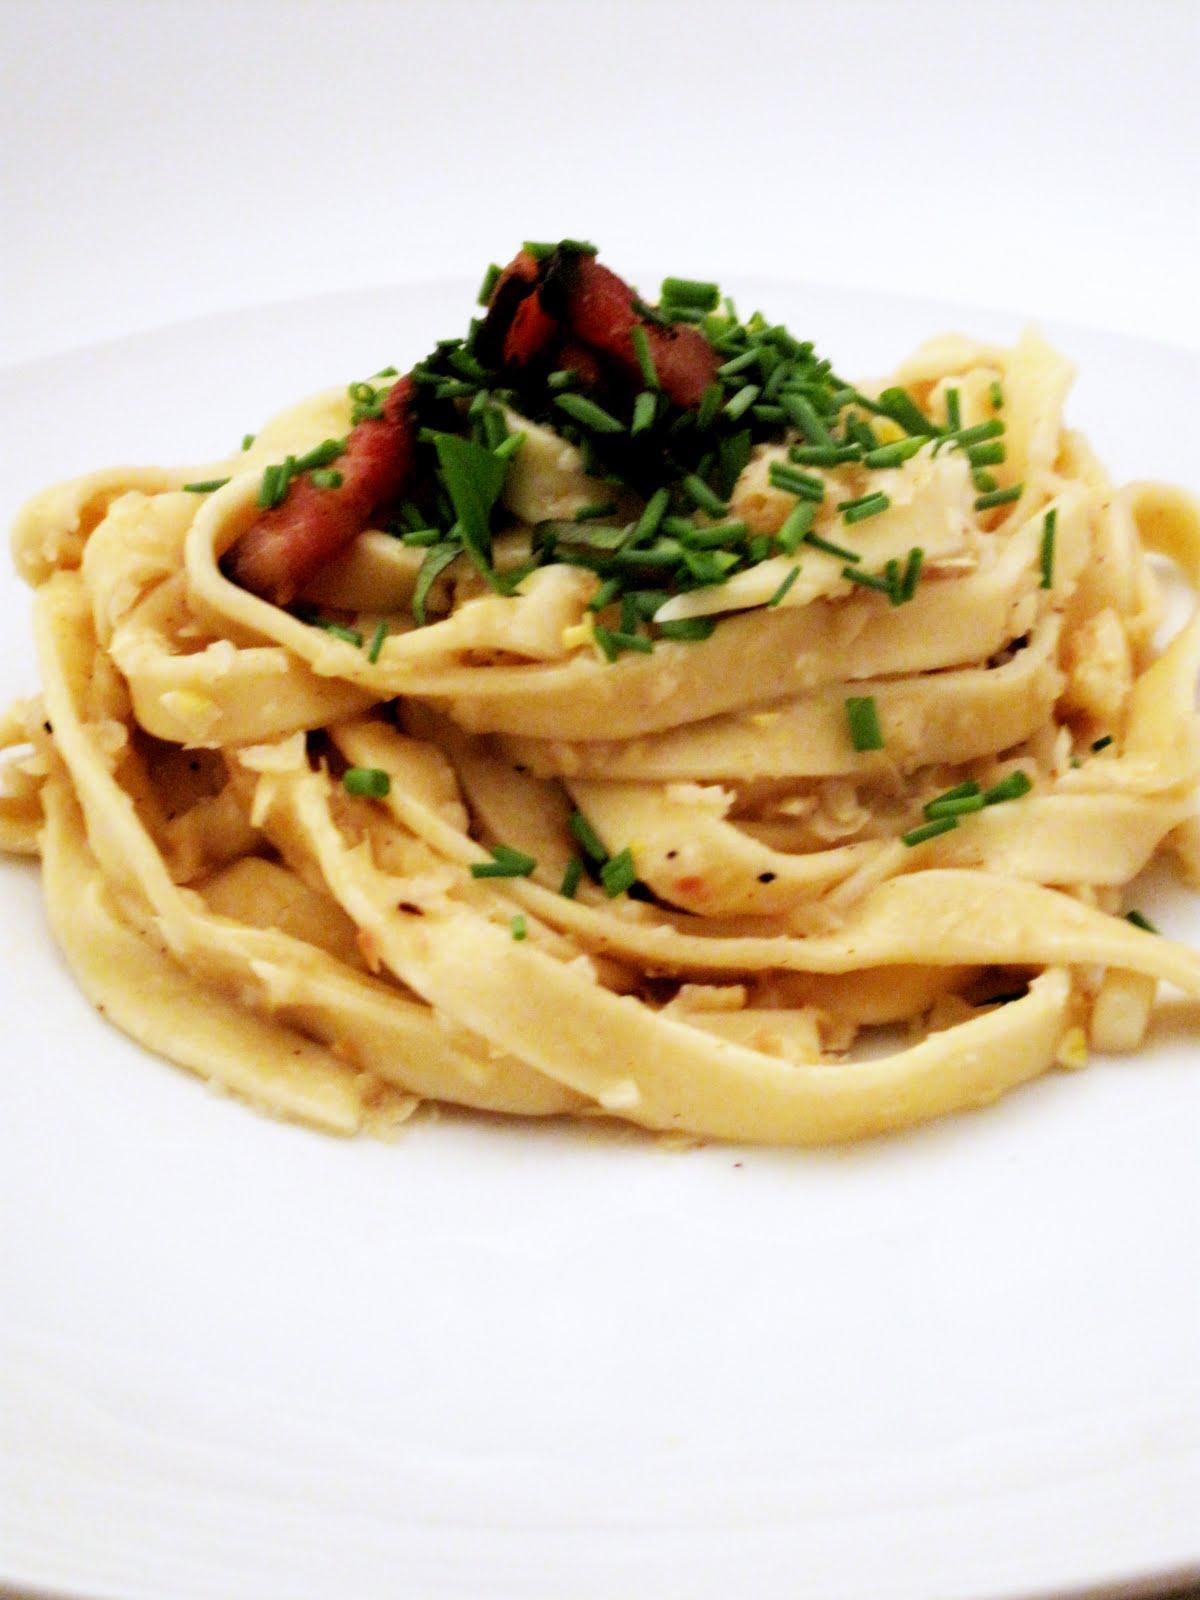 10x10: Homemade Pasta with Bacon and Corn Pesto